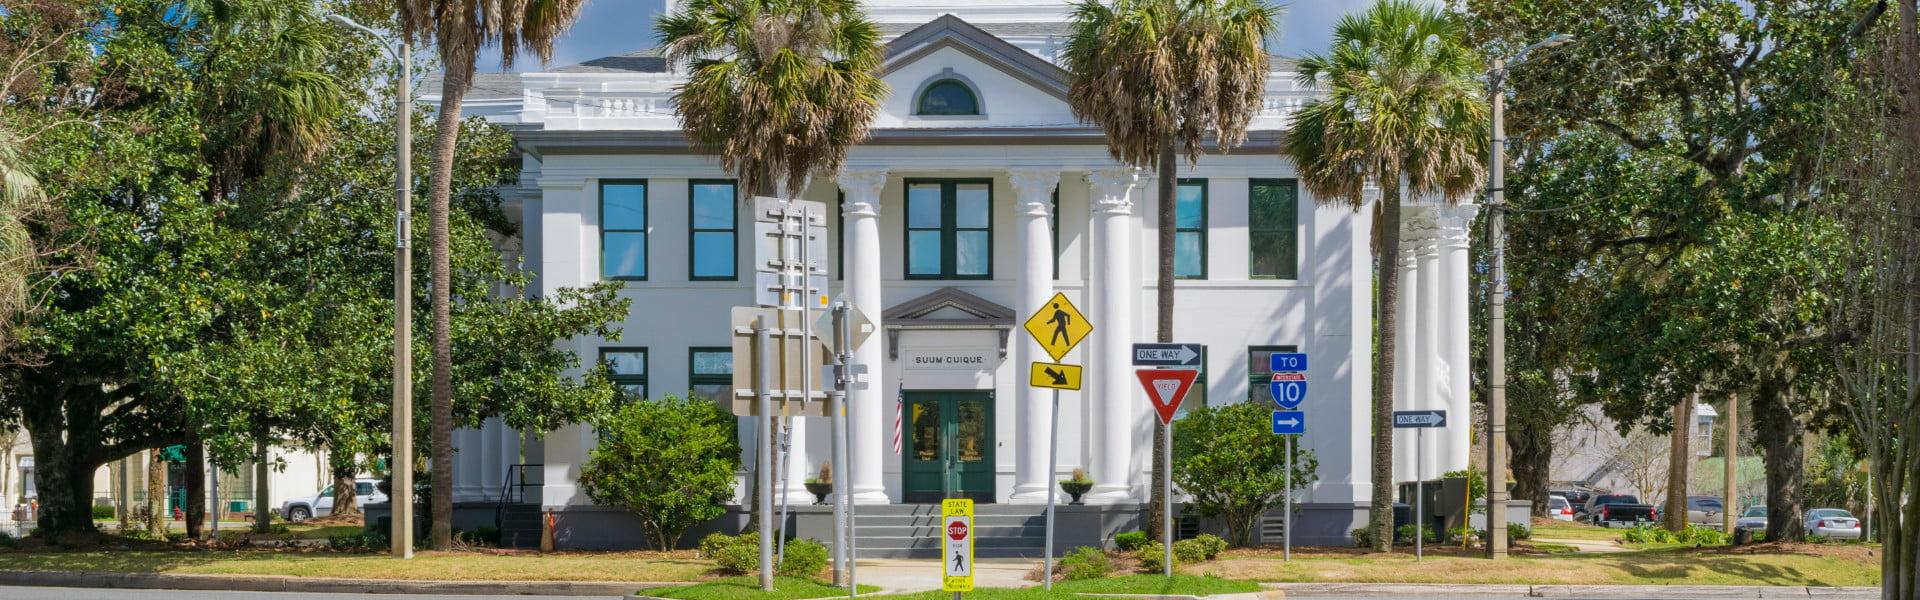 Jefferson County Florida Courthouse